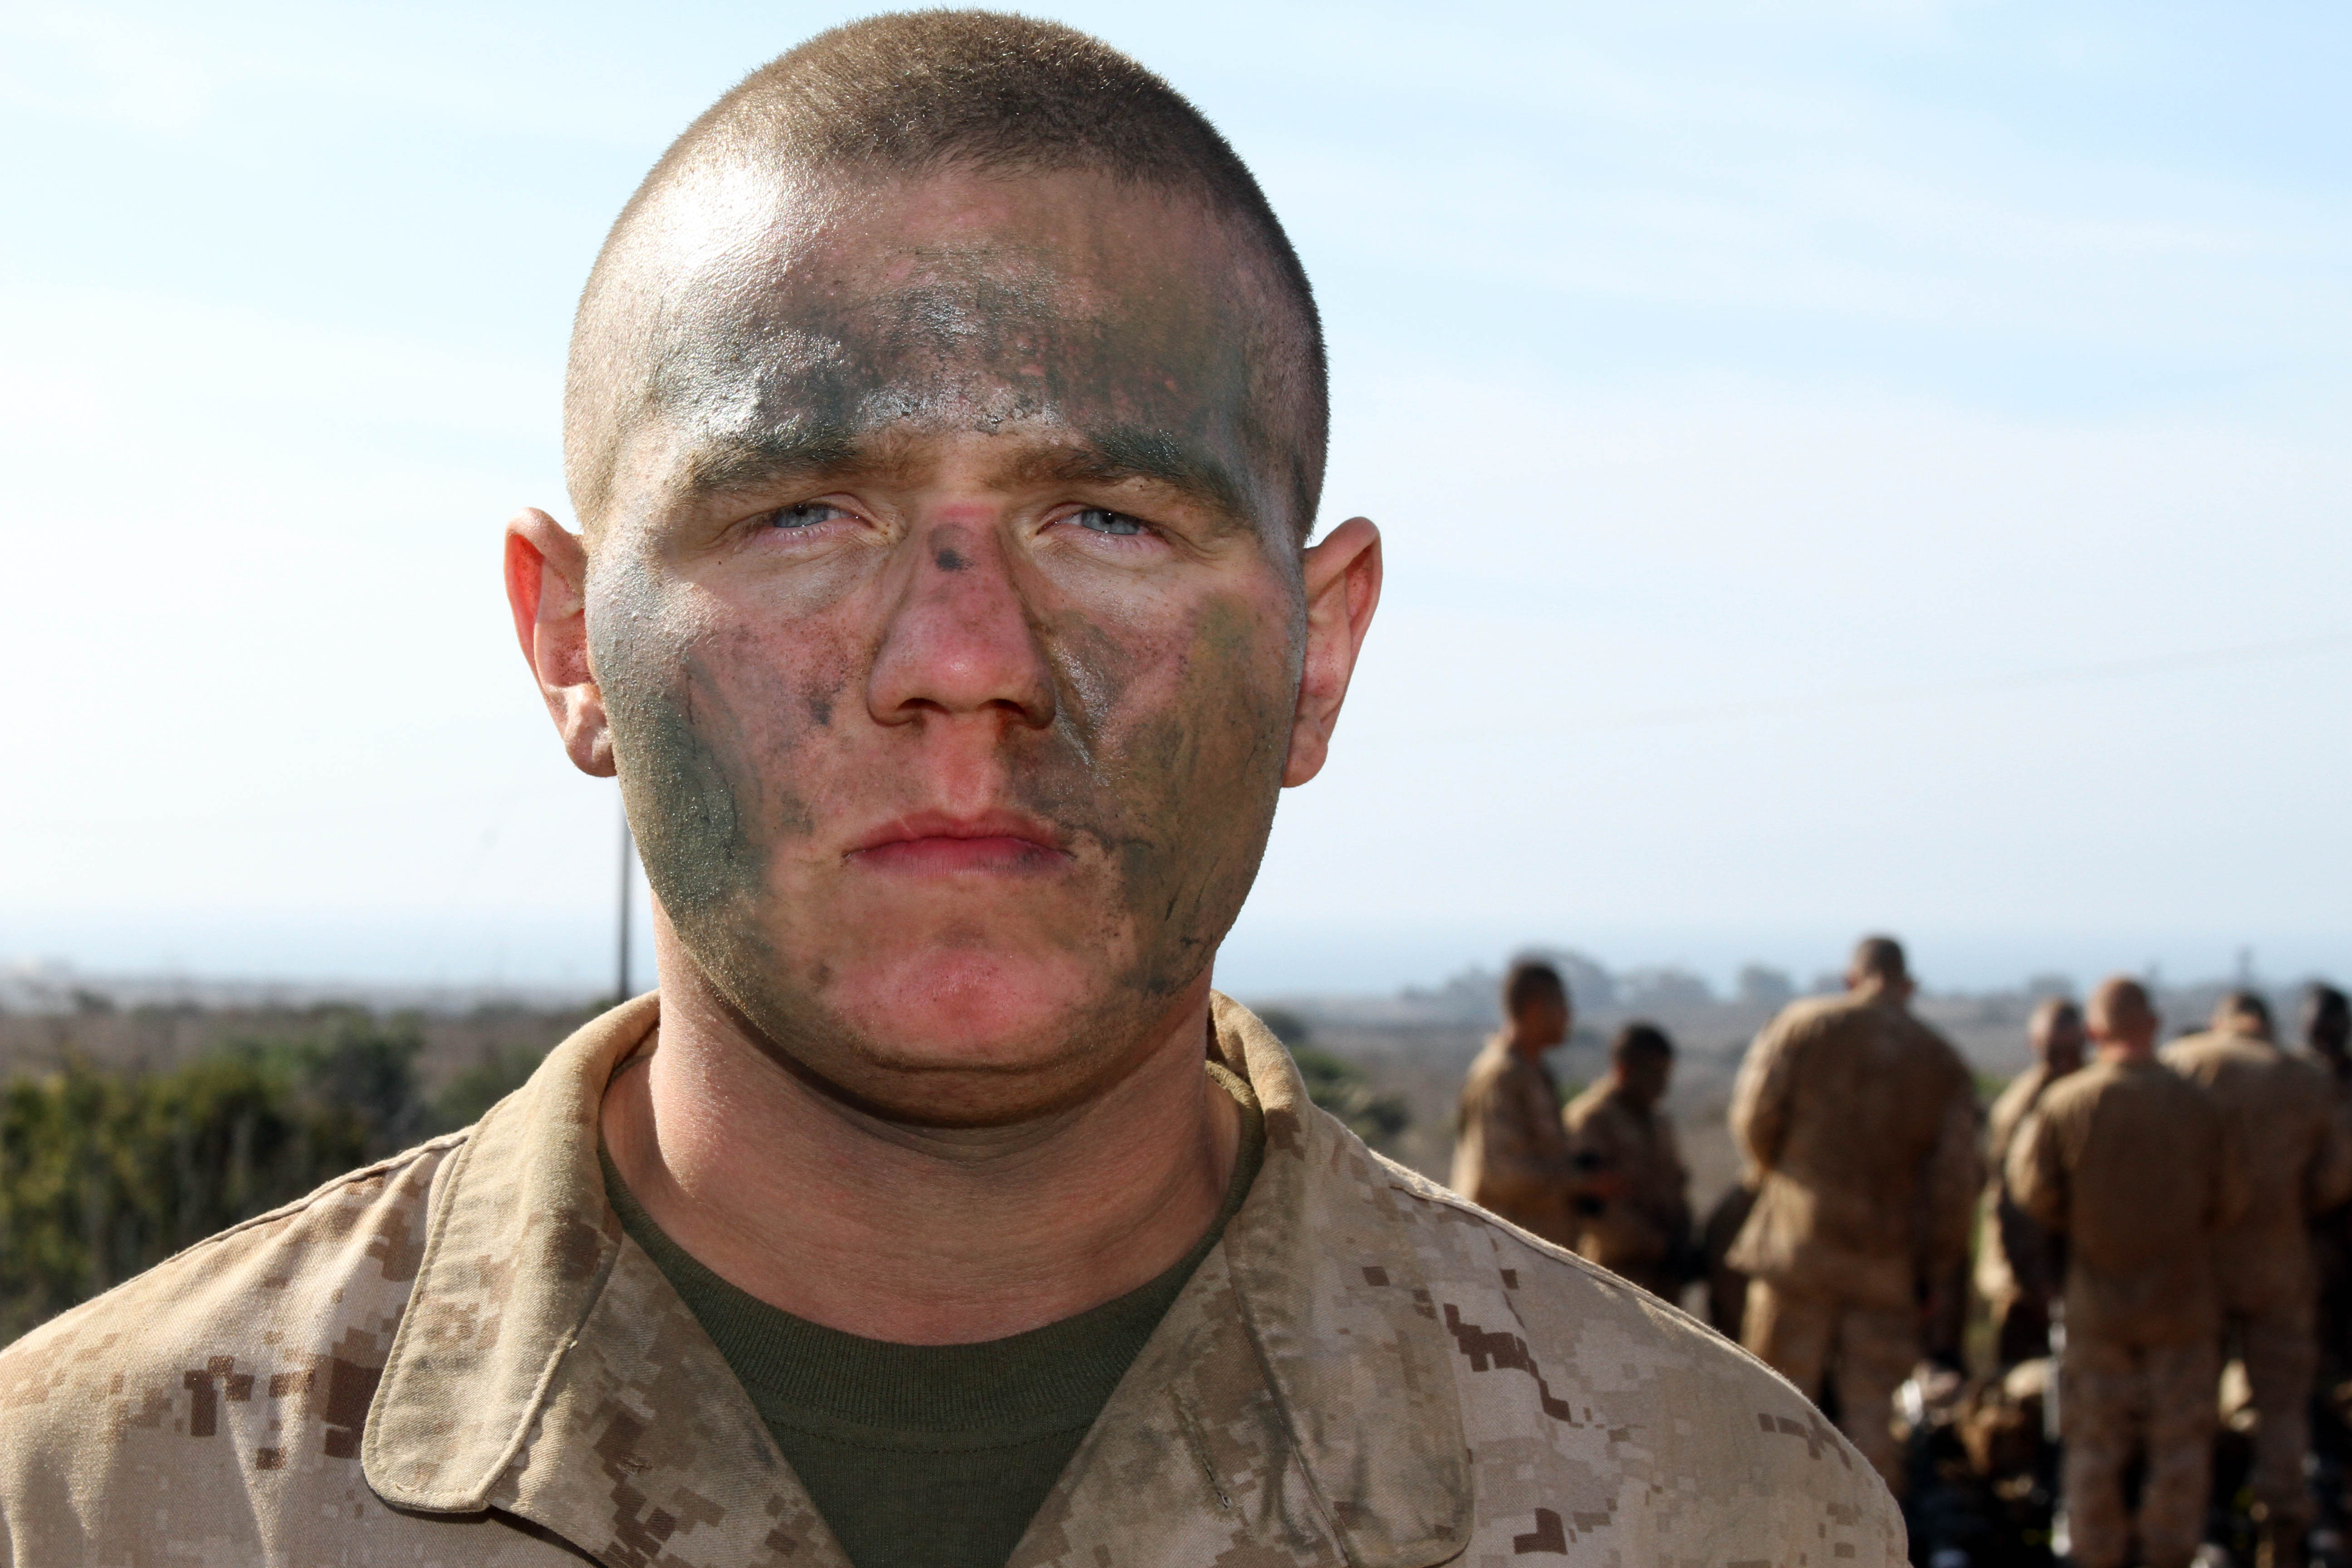 photos pfc elias patten platoon 2111 company e 2nd recruit training battalion